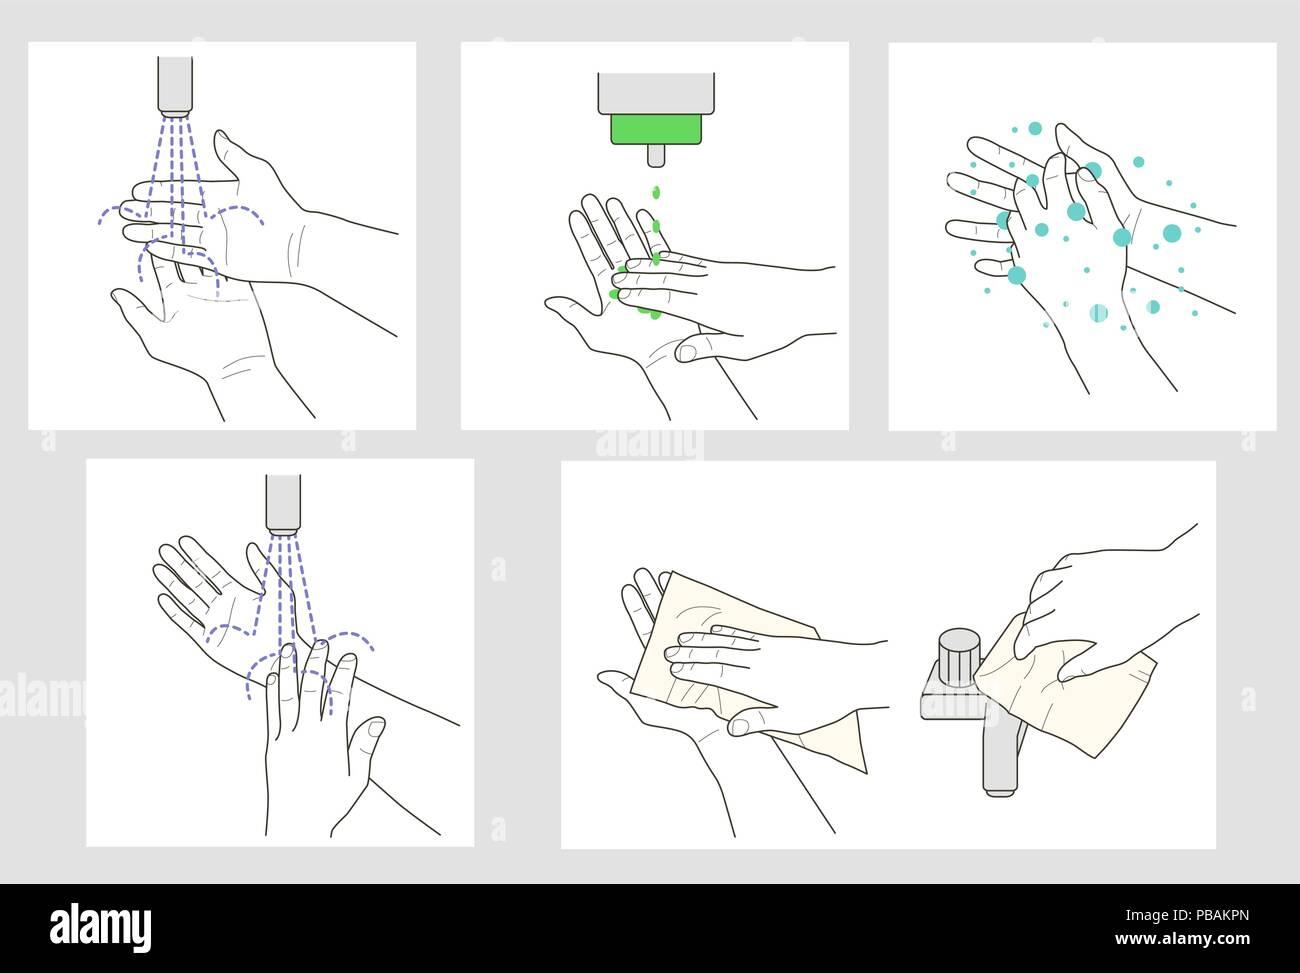 Wash Hands Vector Instruction Stock Vector Art Illustration